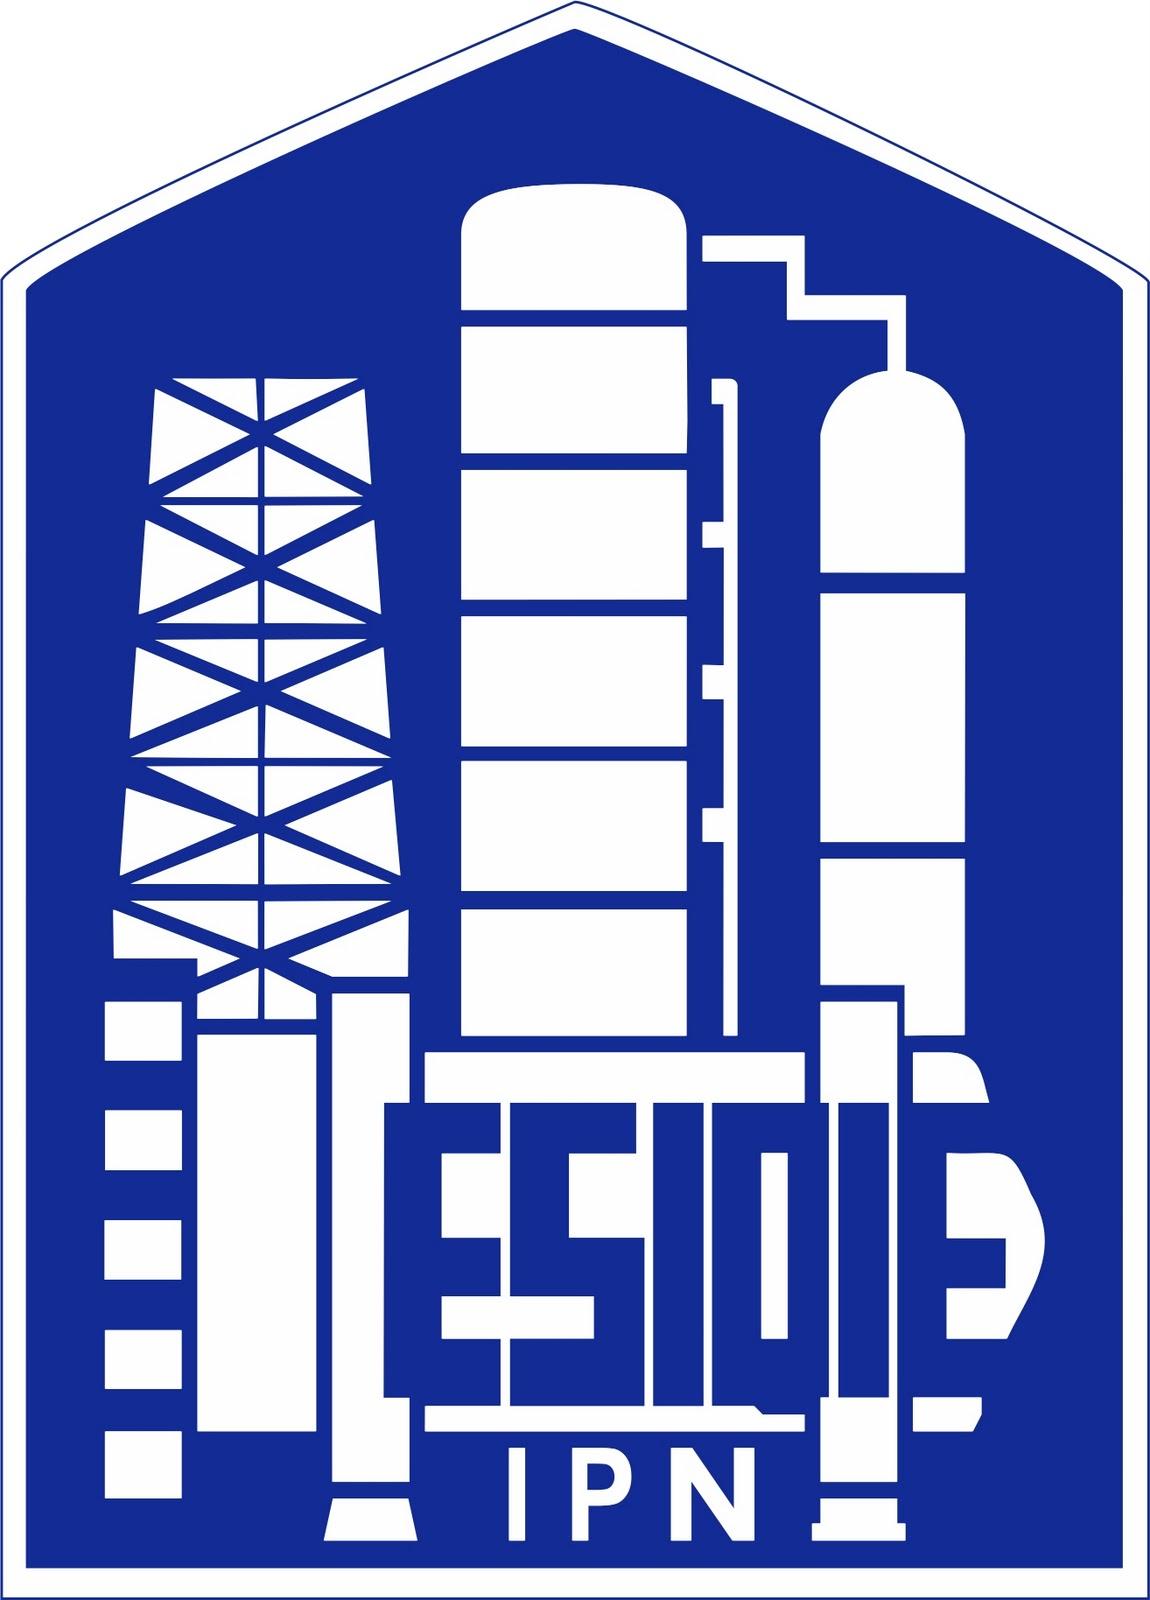 Resultado de imagen para esiqie logo png